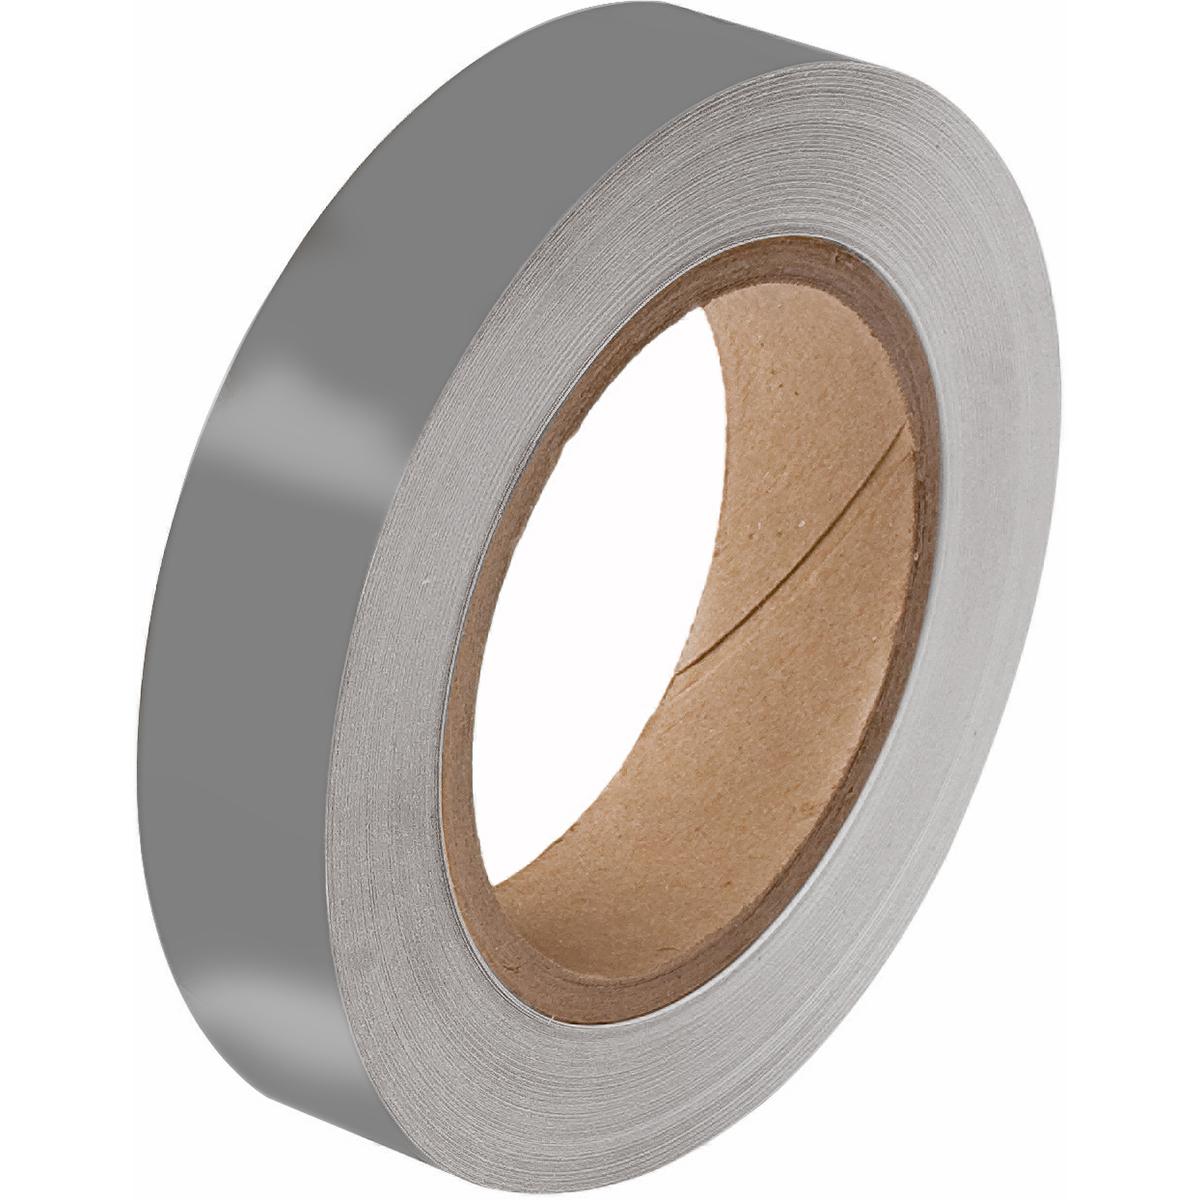 Pipe Banding Tape - Grey